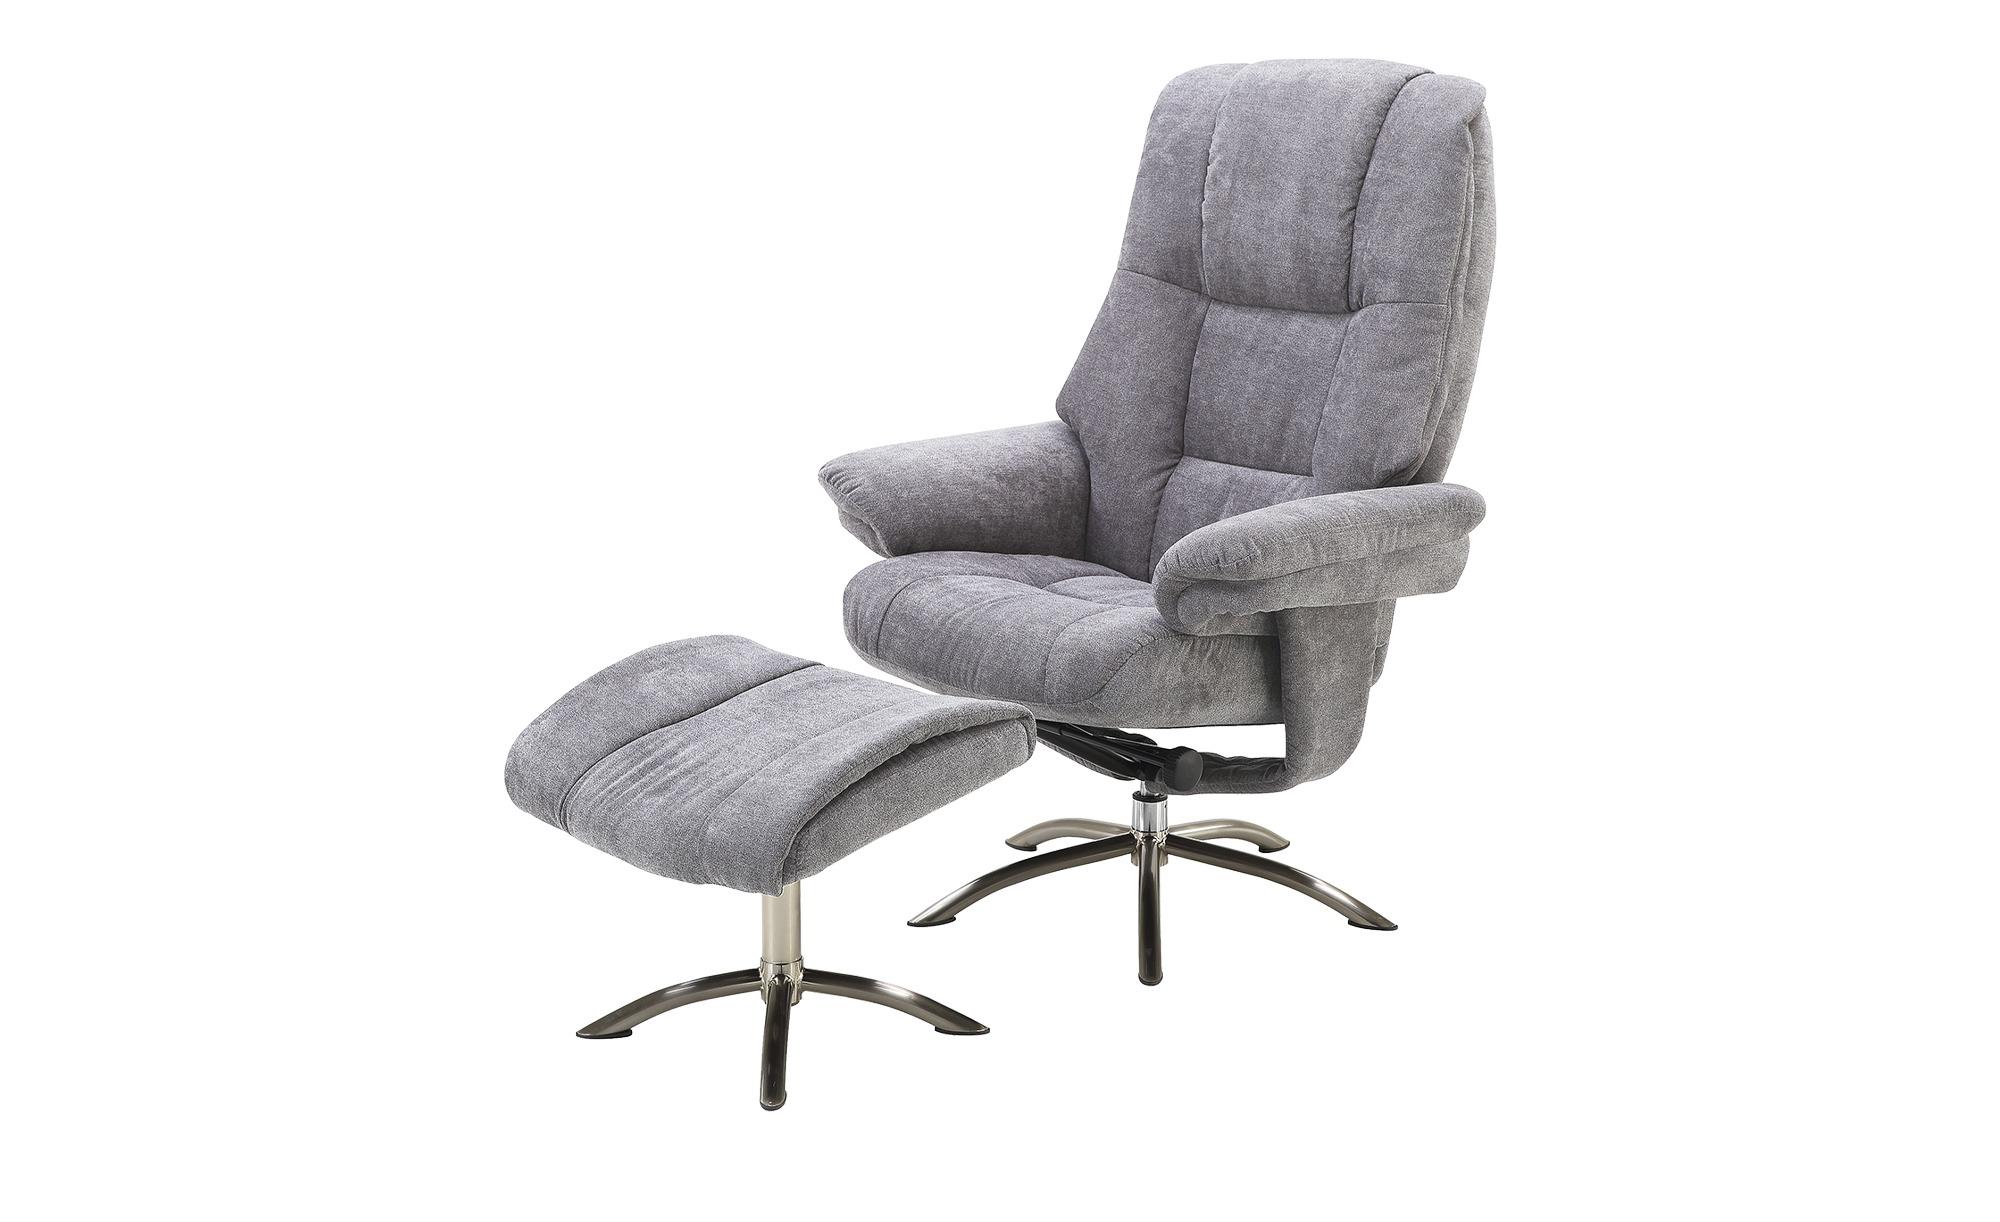 Relaxsessel  Gina ¦ grau ¦ Maße (cm): B: 78 H: 114 T: 86 Polstermöbel > Sessel > Fernsehsessel - Höffner